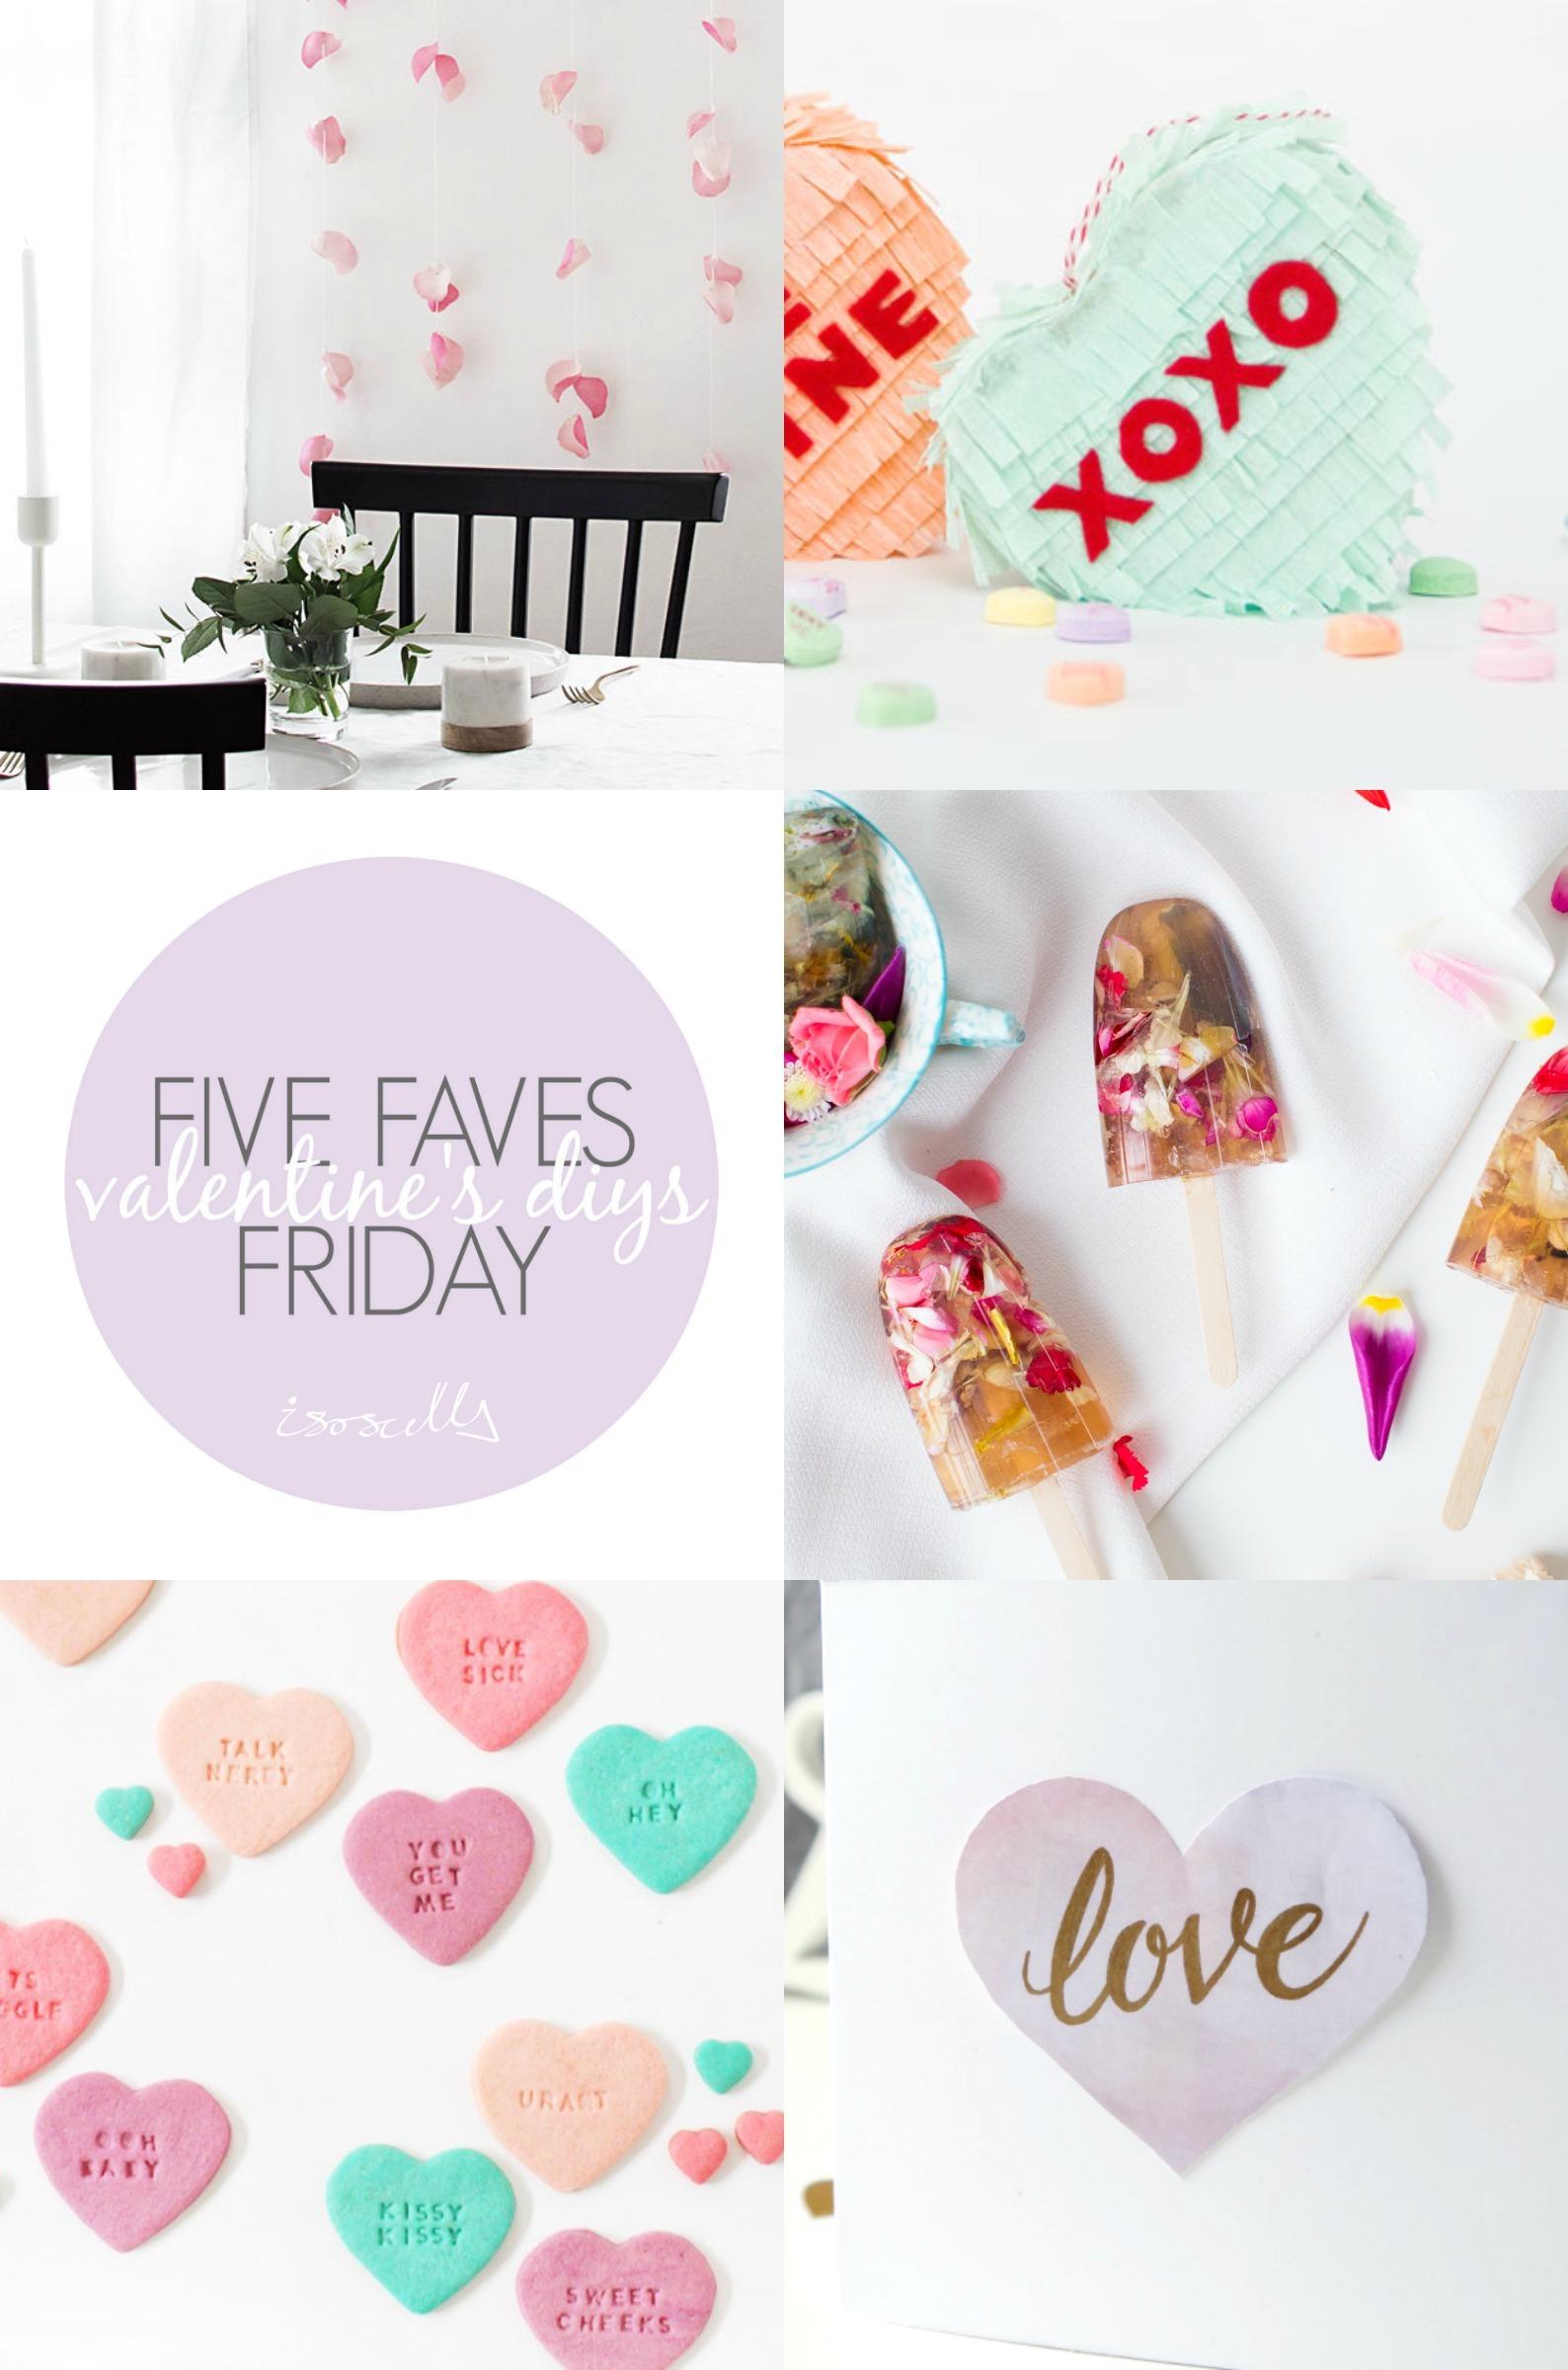 Five Faves Friday // Valentine's DIYs on Isoscella